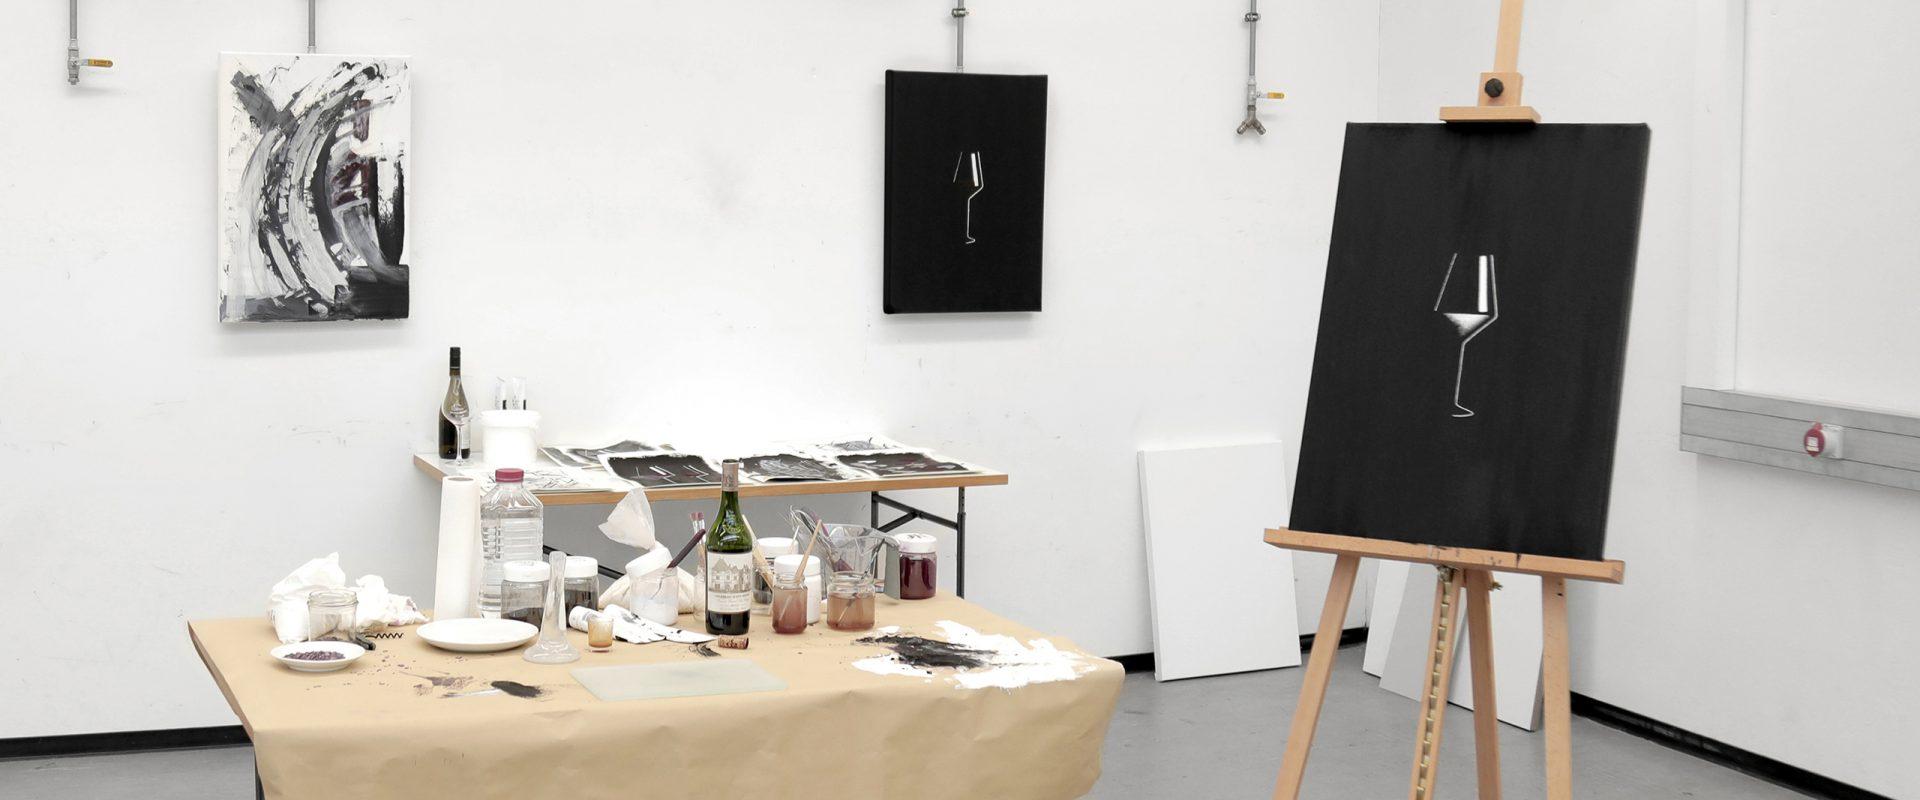 atelier_dario_succari_wine_art_painting_vin_wein_chateau_haut_brion_64x27_4